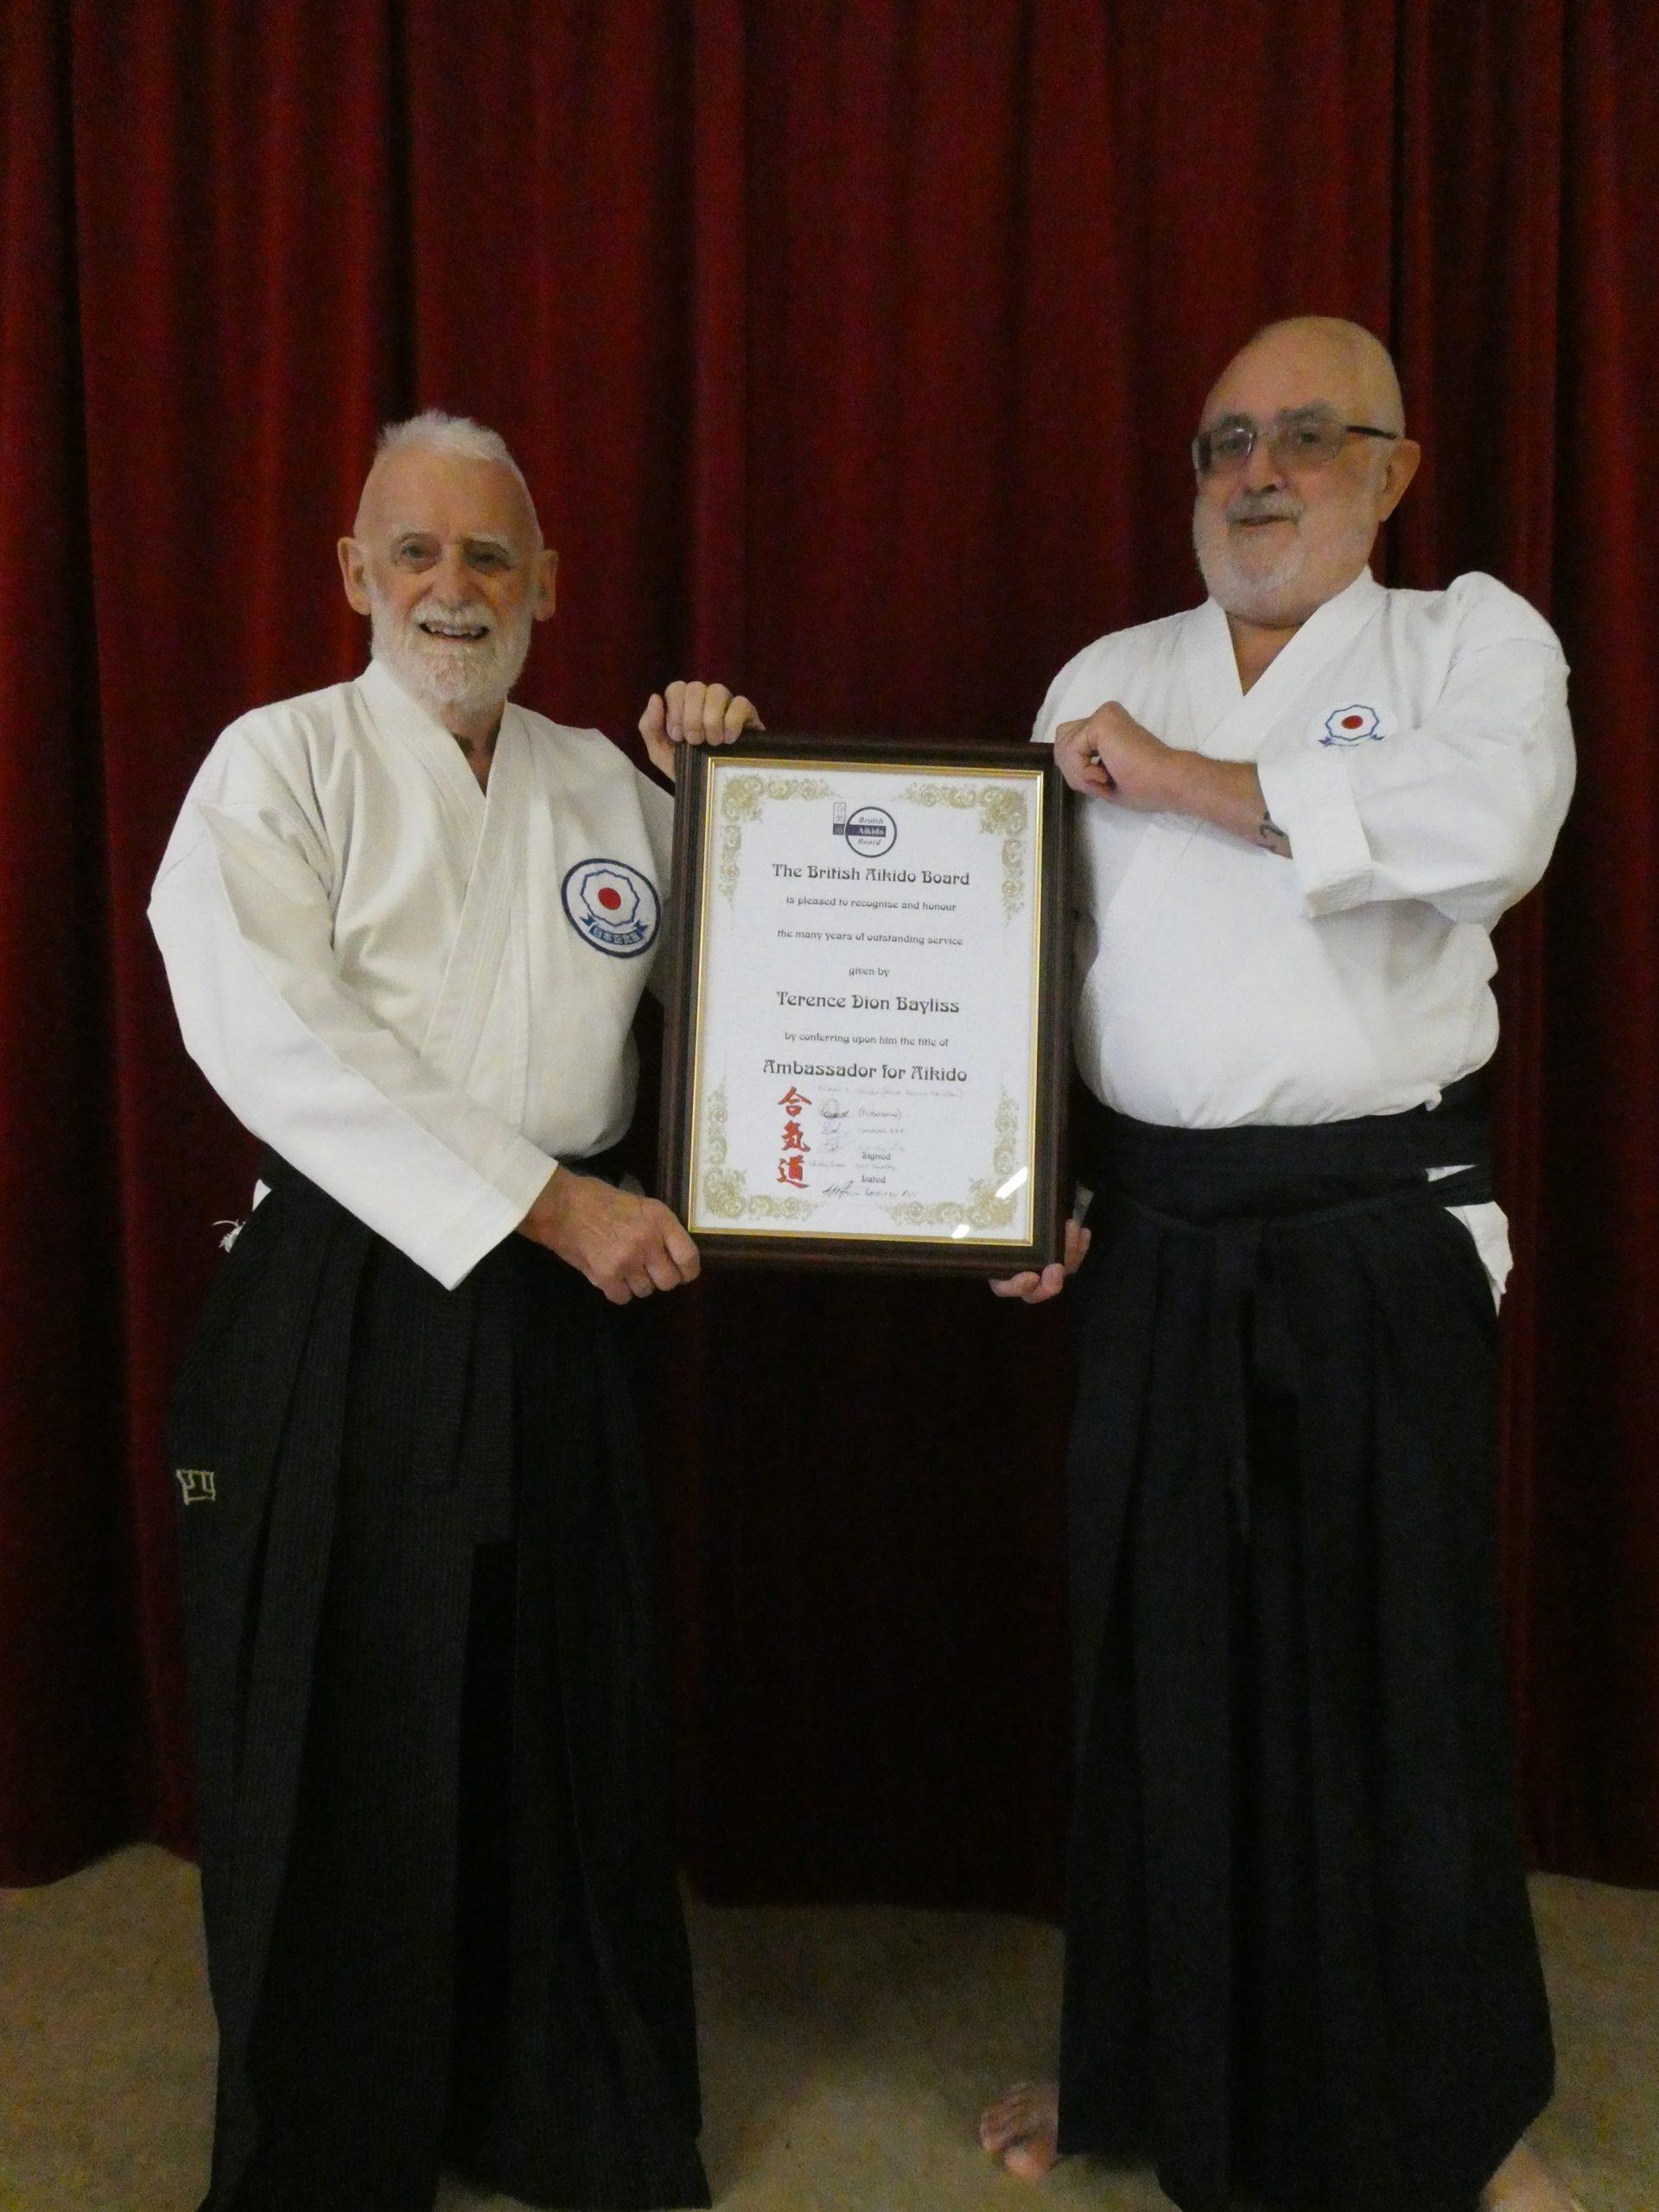 Sensei Bayliss and Sensei Sheridan with BAB certificate